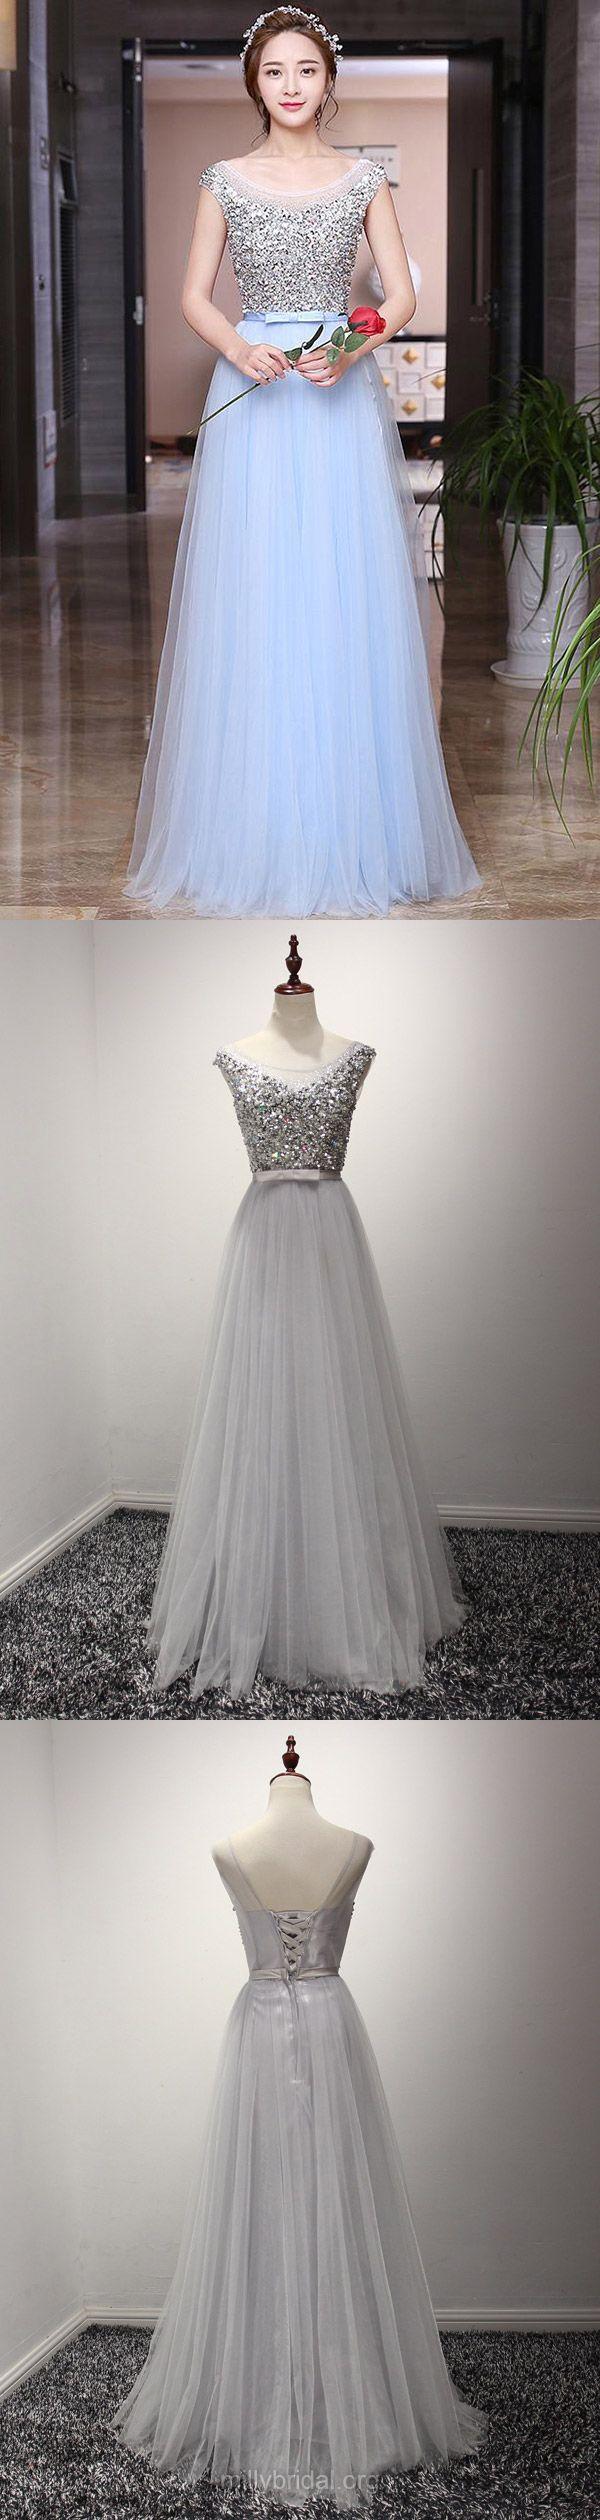 Long prom dresses blue prom dresses for teens cheap aline